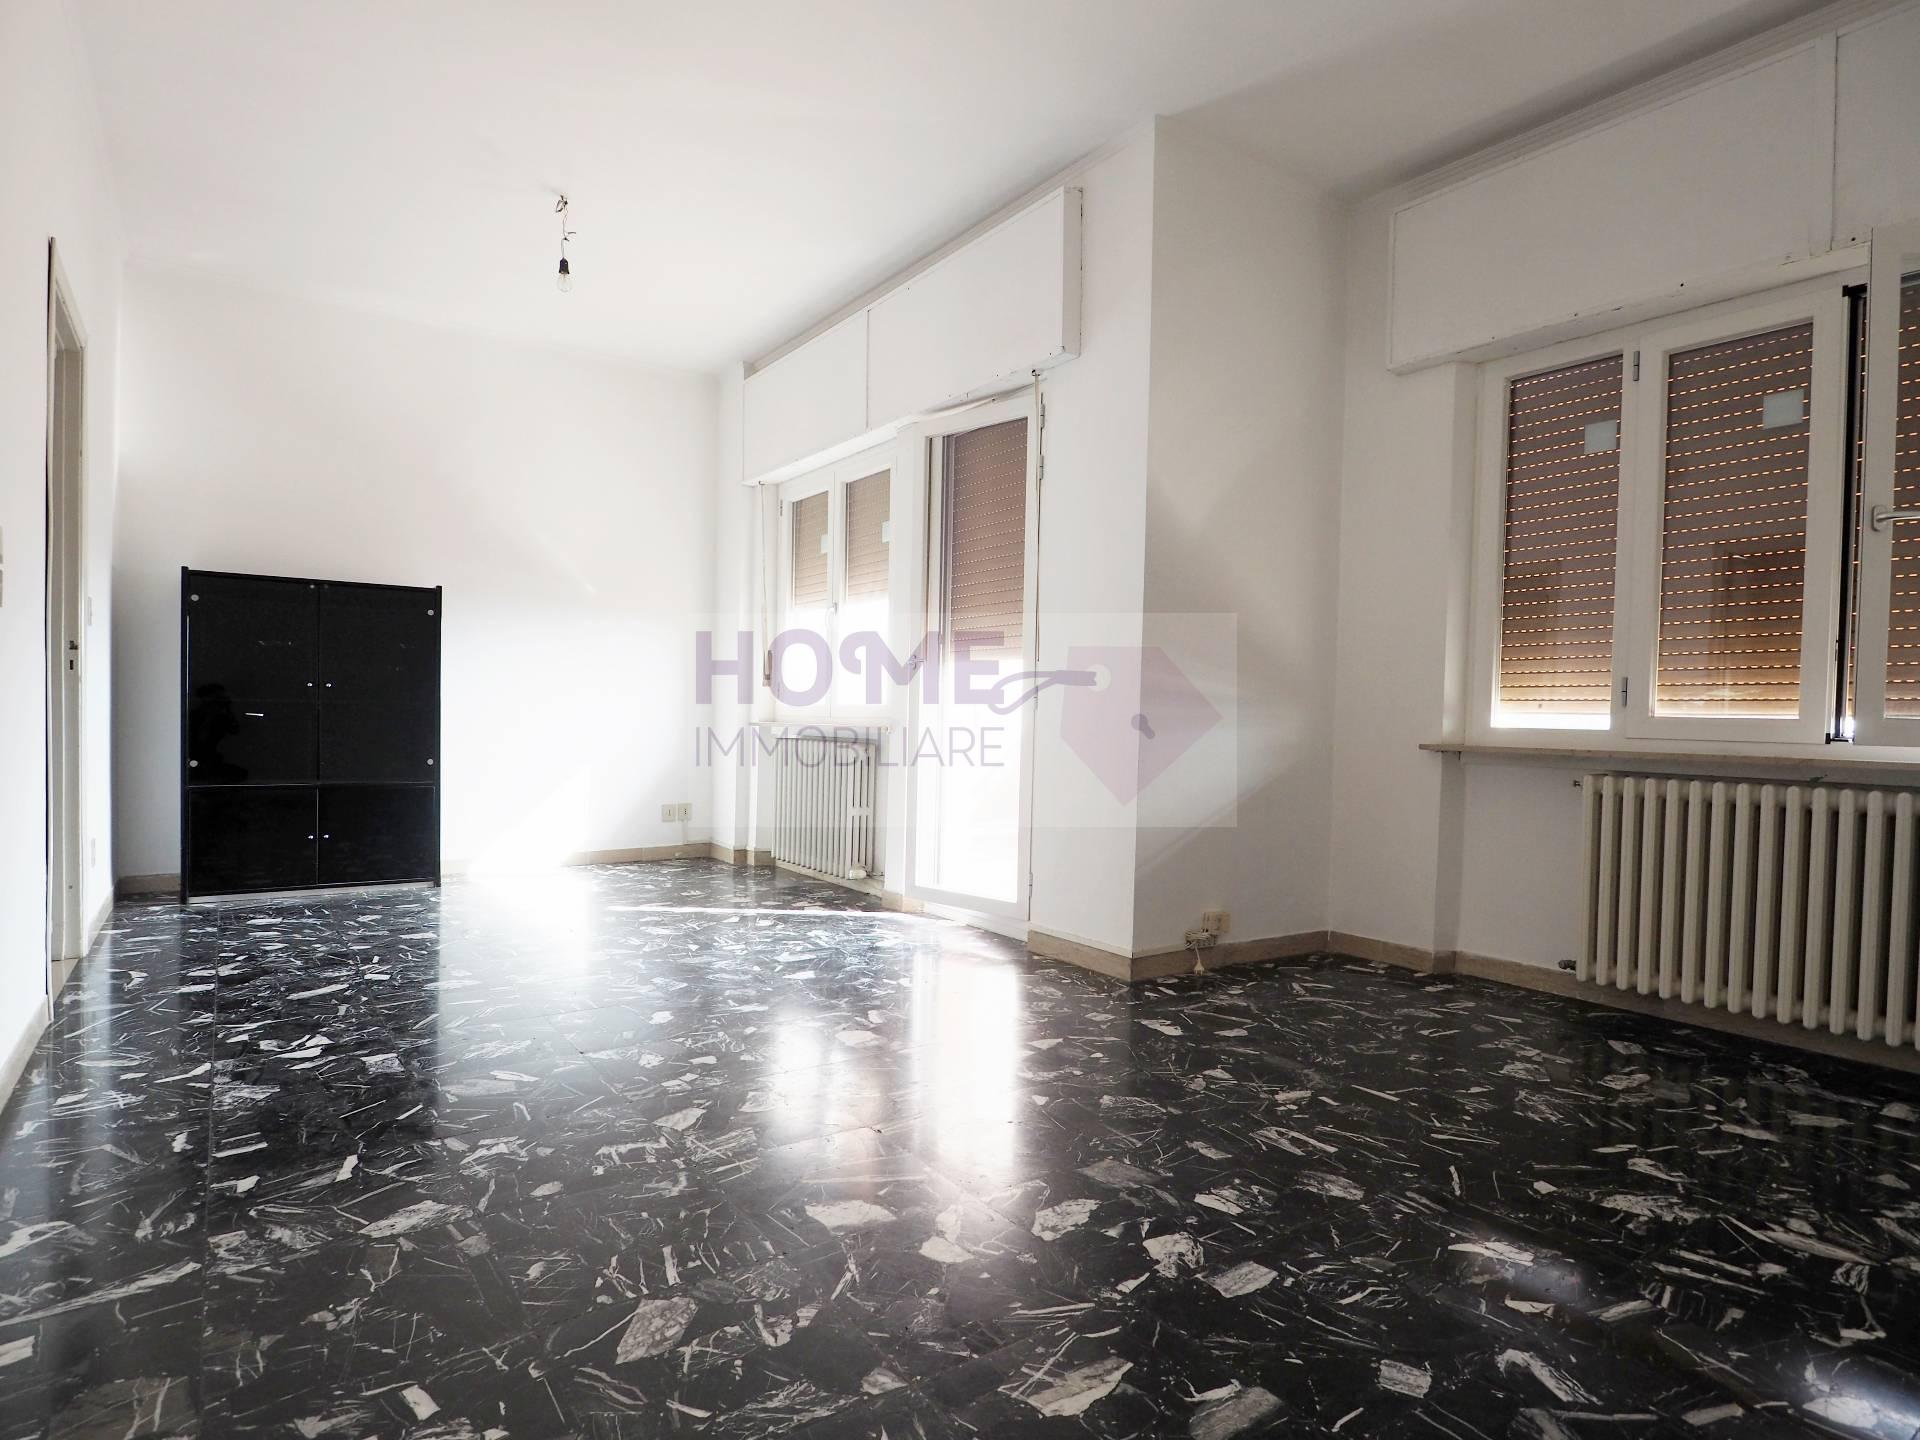 macerata vendita quart: zona via spalato home immobiliare srl